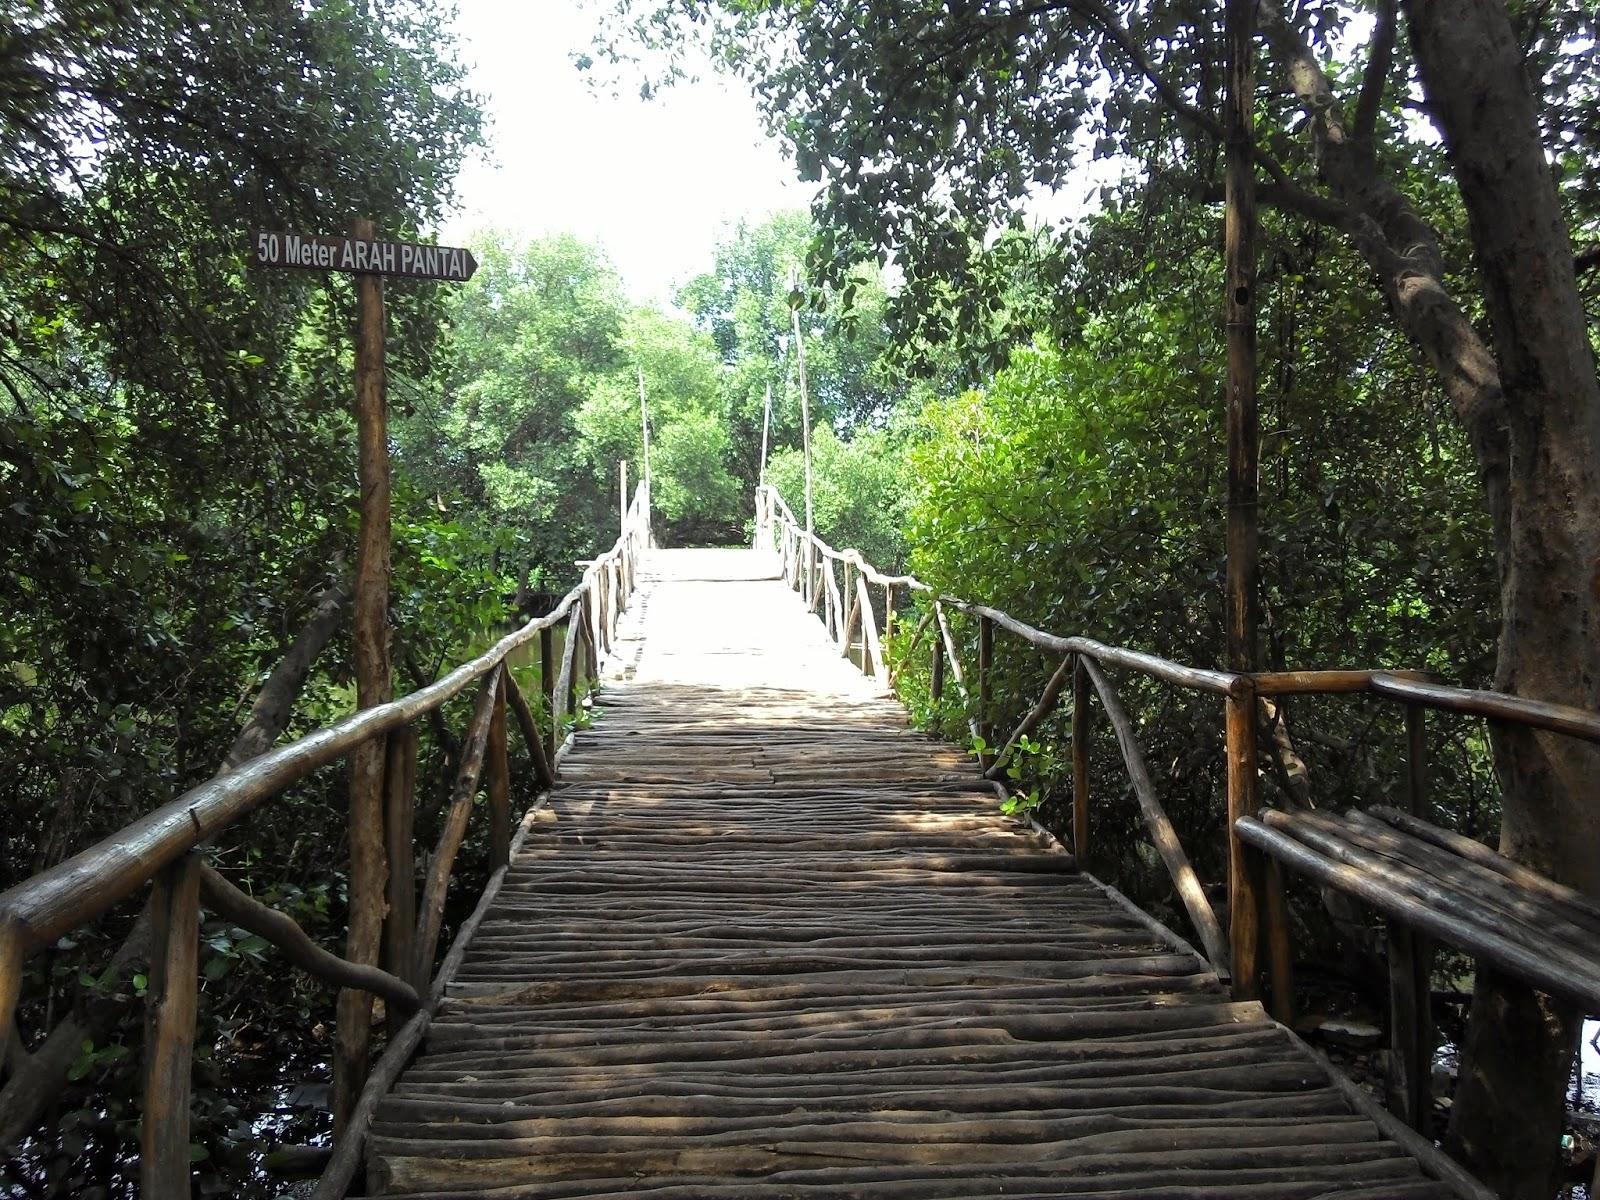 lokasi hutan mangrove ini cukup terawat semoga dengan naiknya tiket masuk seharga sekarang perawatan taman wisata dapat